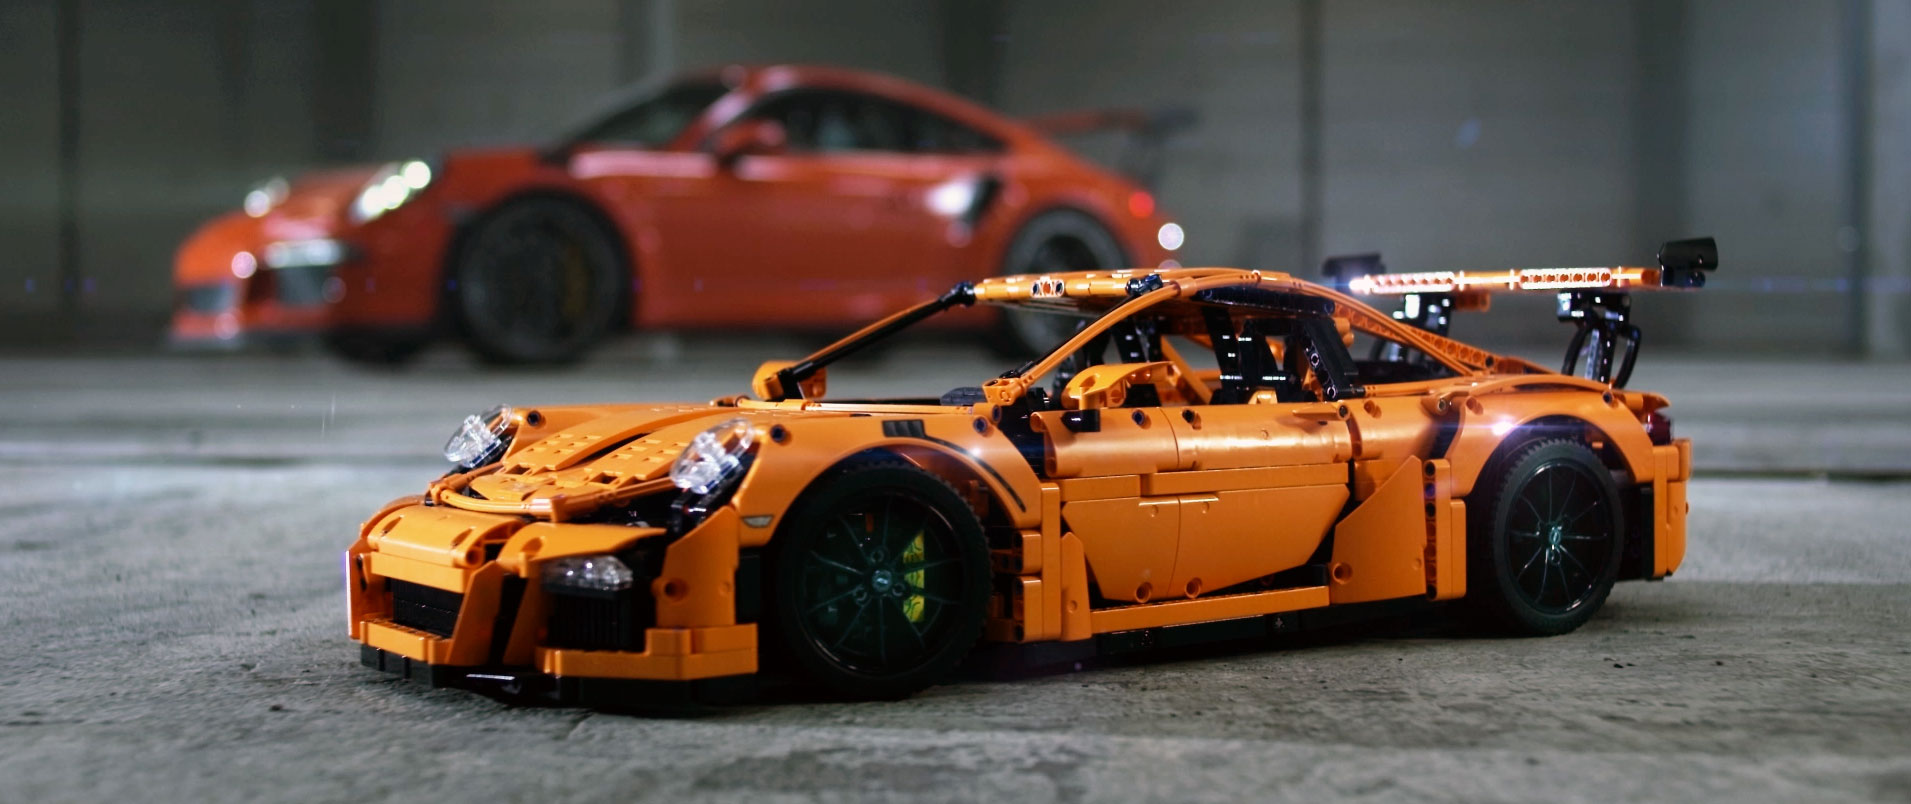 brickfinder win a lego technic porsche 911 gt3. Black Bedroom Furniture Sets. Home Design Ideas